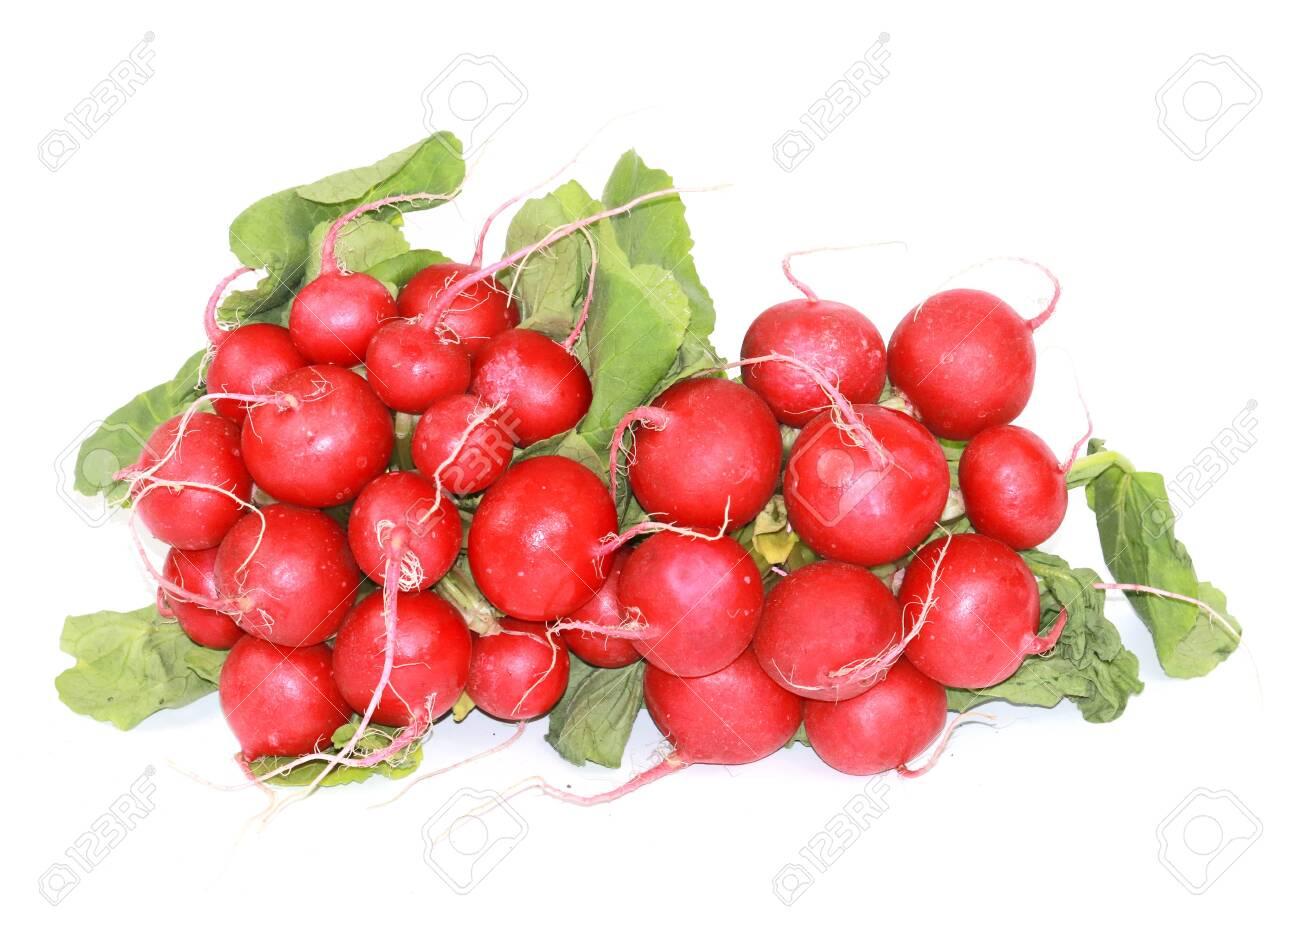 Tubers of ripe radishes - 120924203